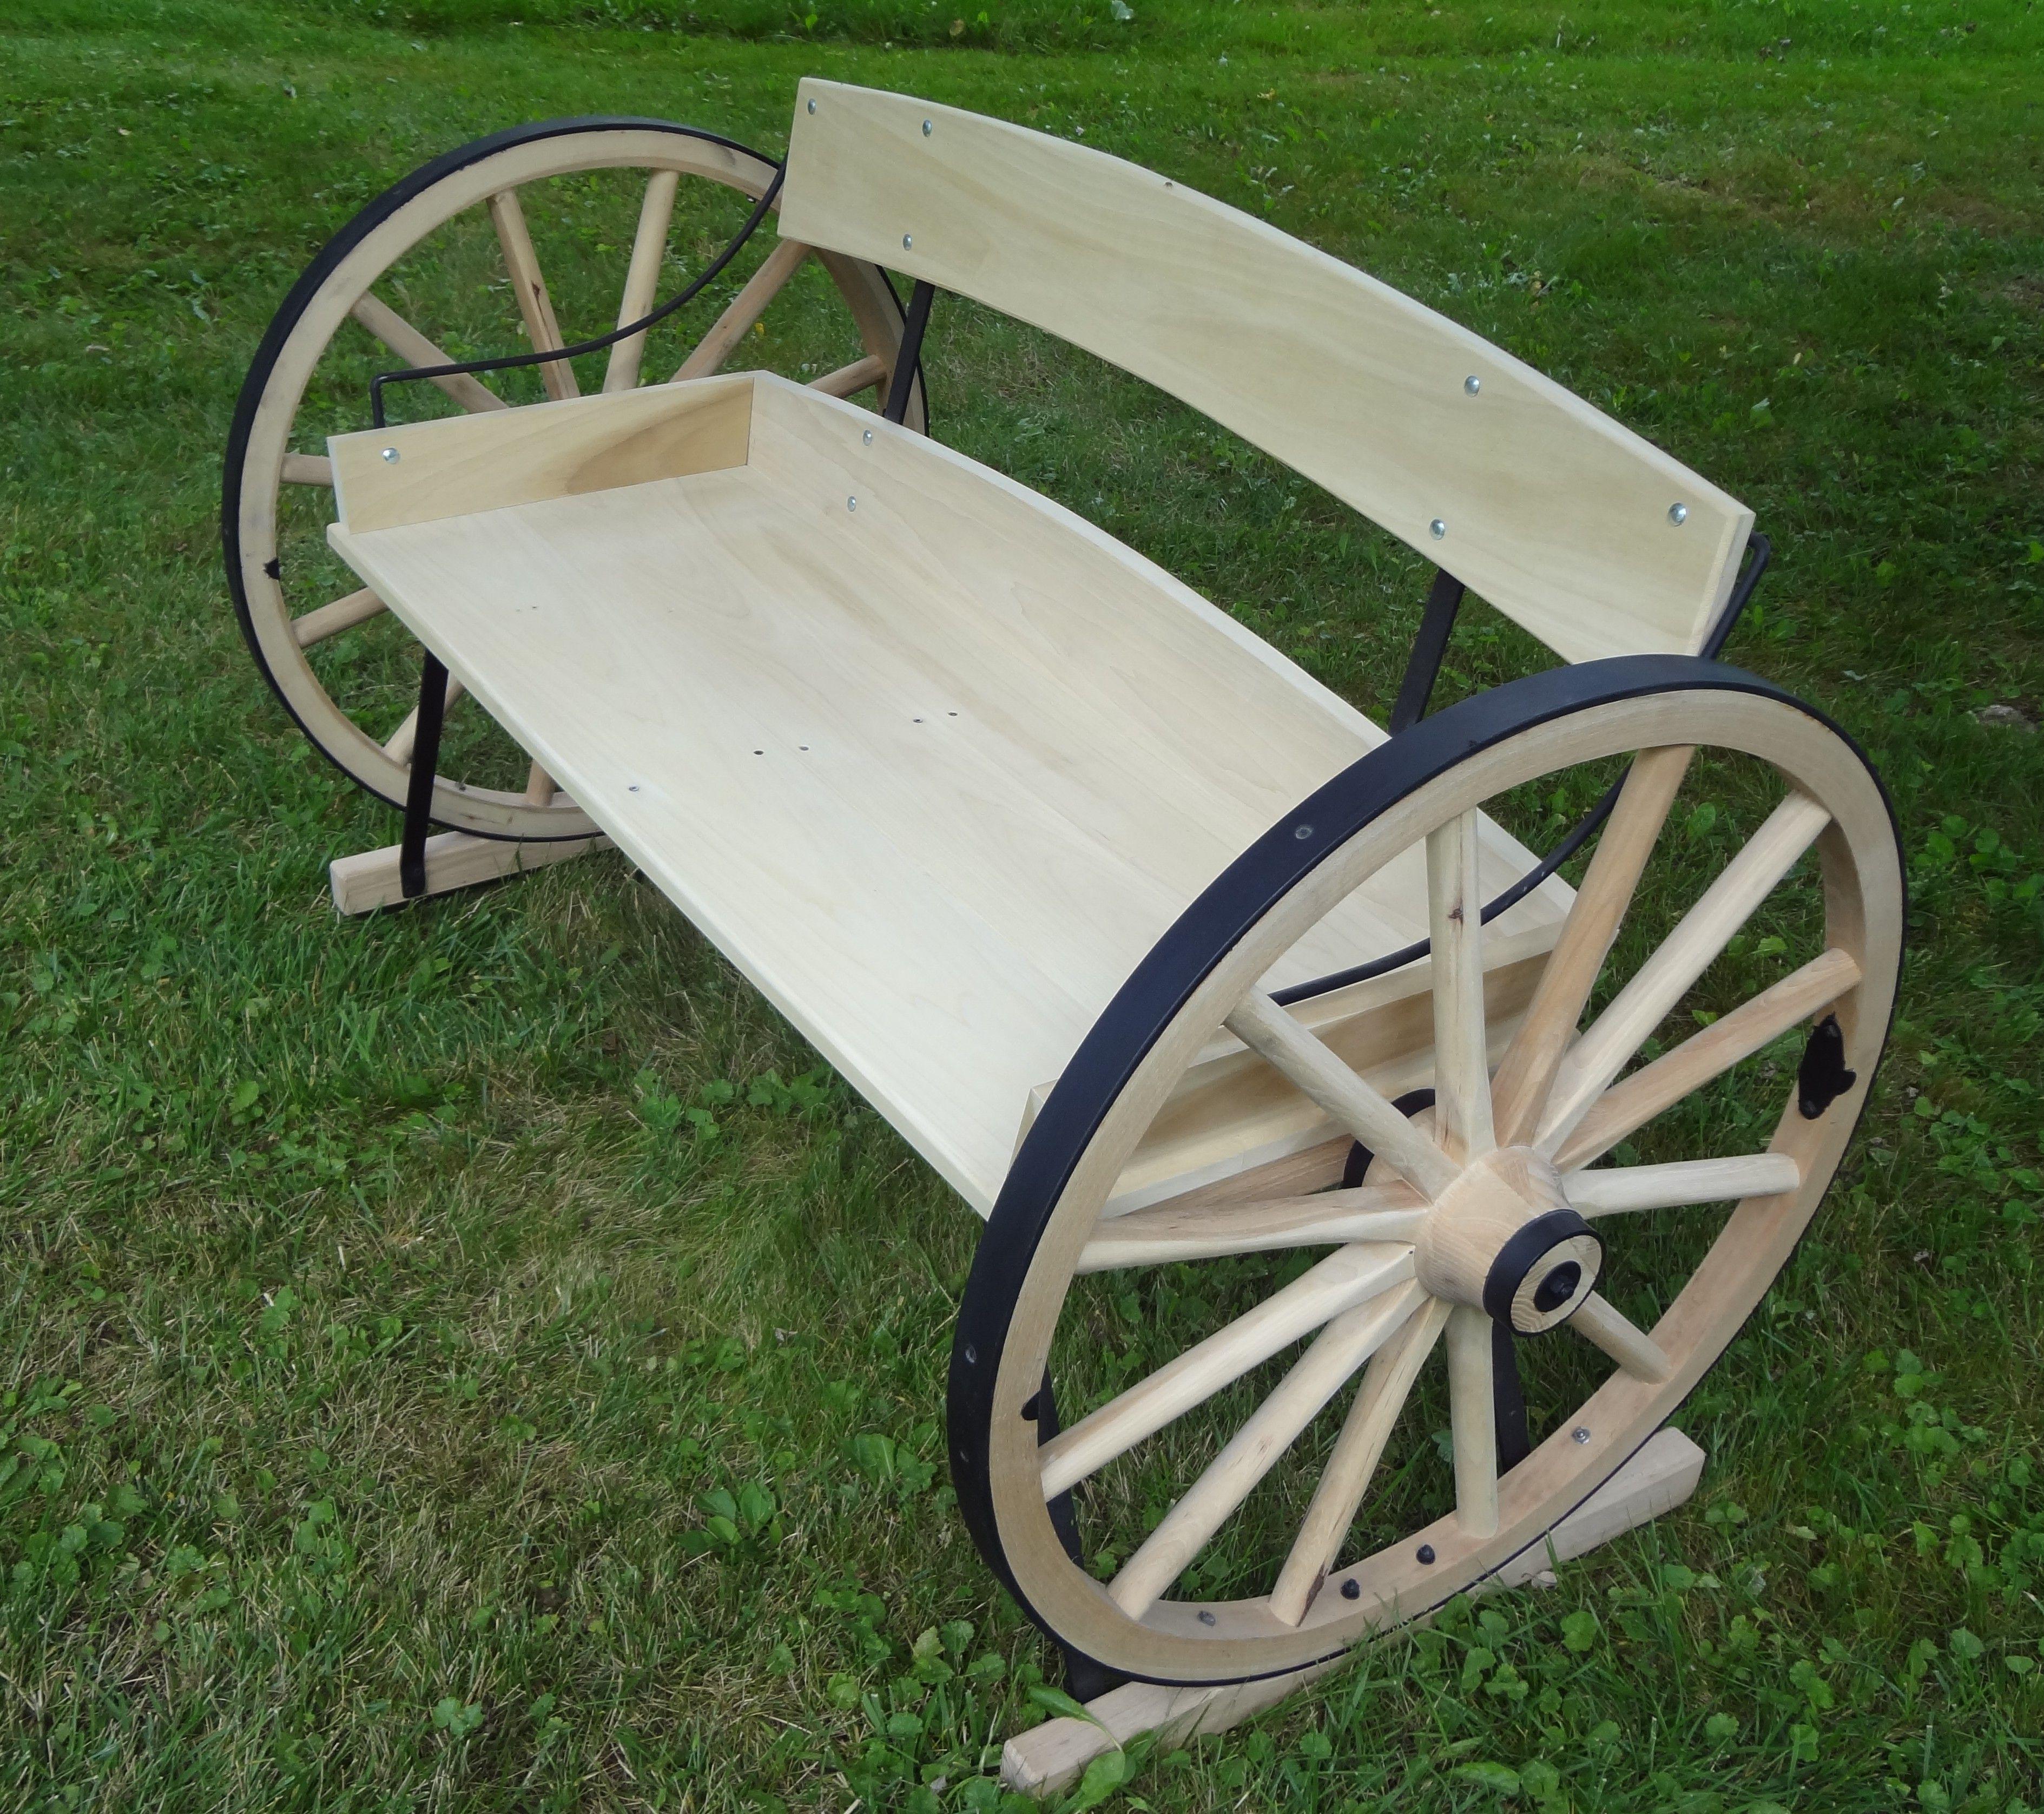 Wagon Wheel Bench In 2019 Goods